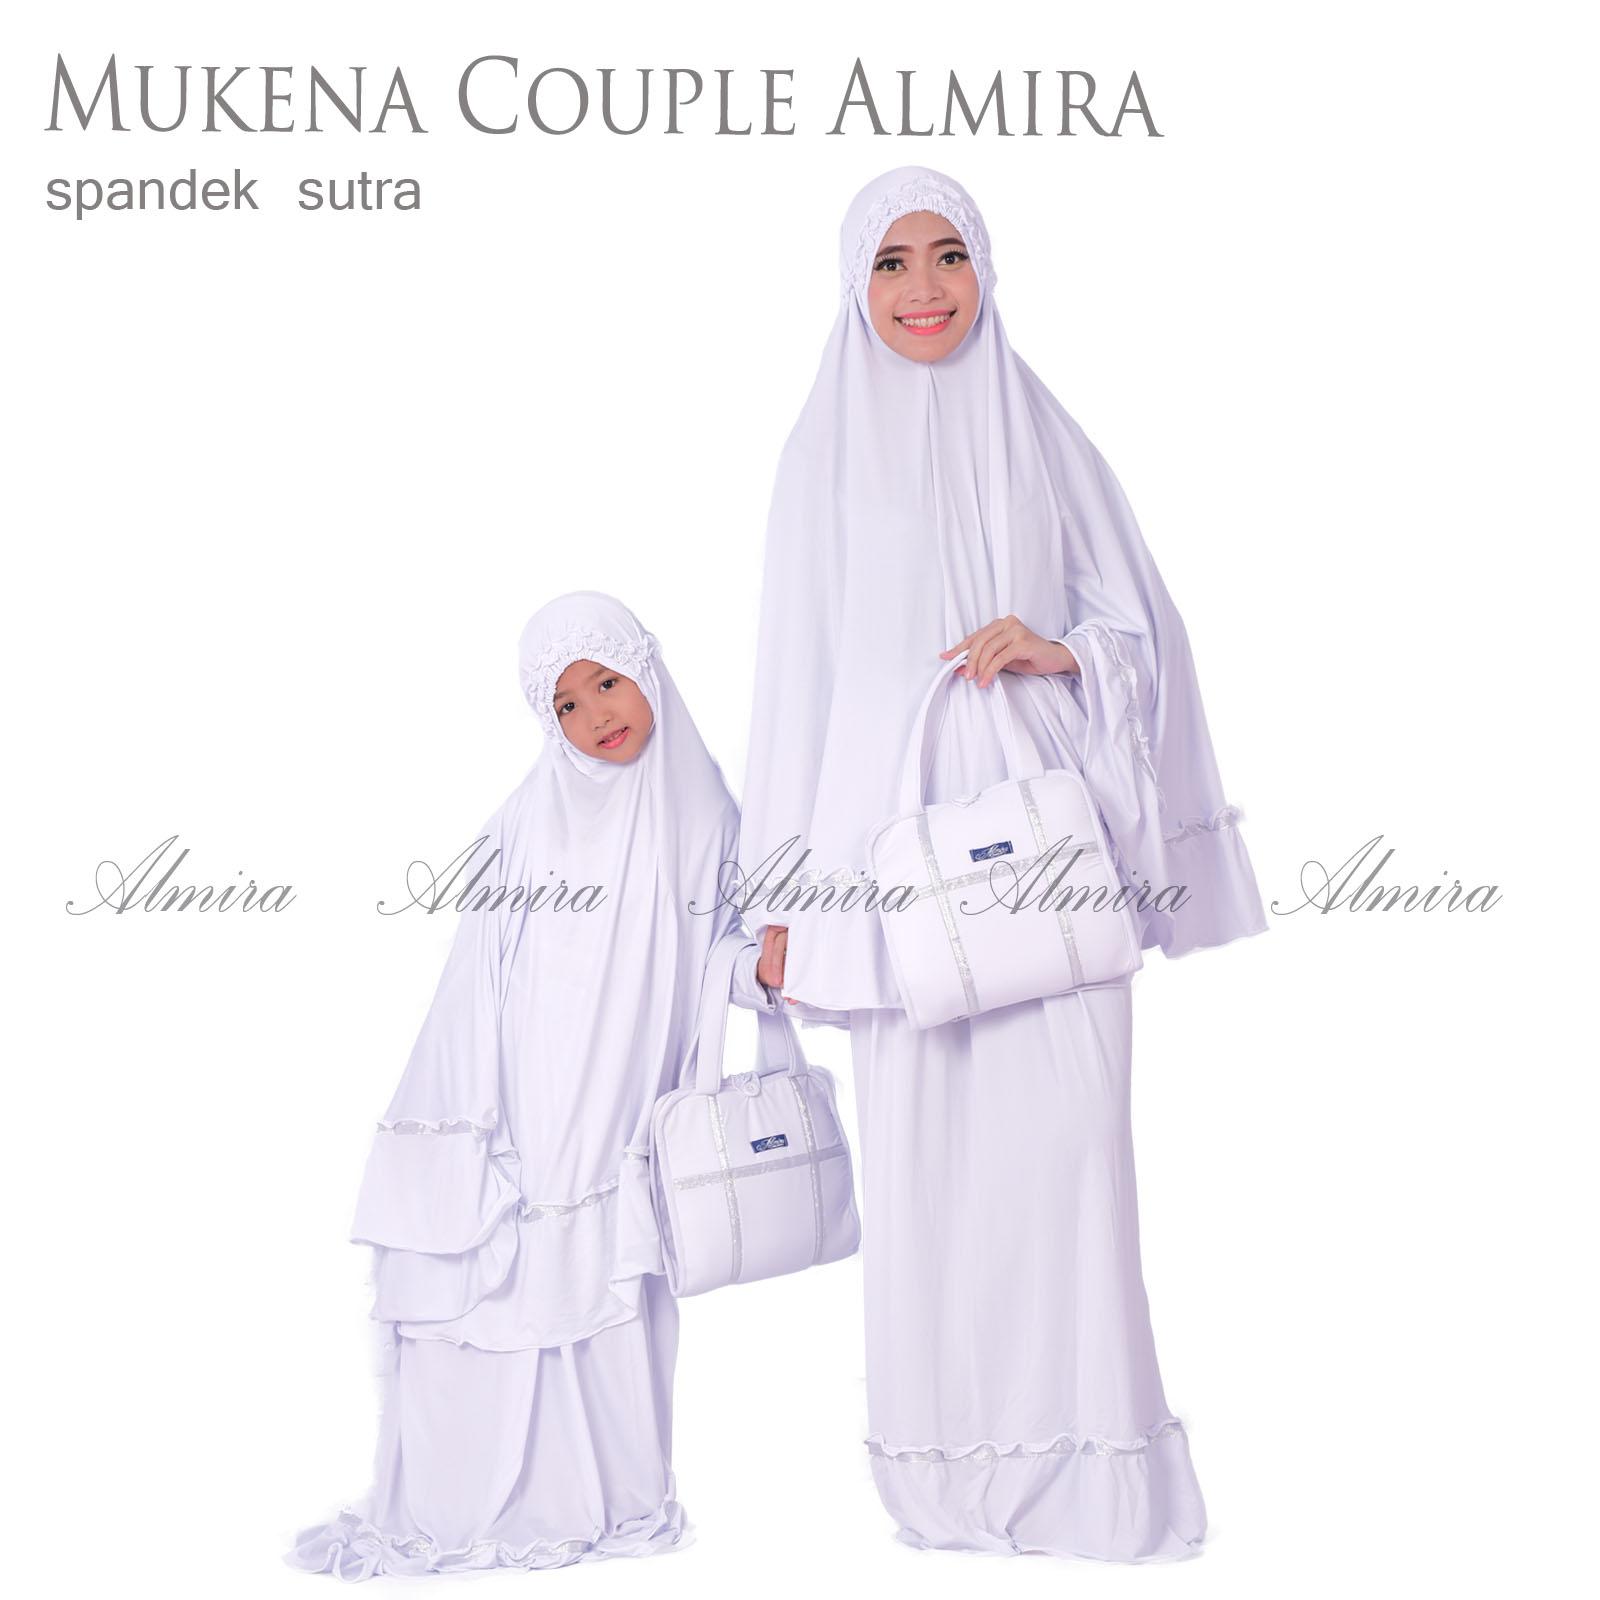 Ukhuwah Mukena Anak Putih Update Daftar Harga Terbaru Indonesia Bordir Homemade Hafsyah Katun Malika Couple Biru Terlengkap Source Kemko 2018